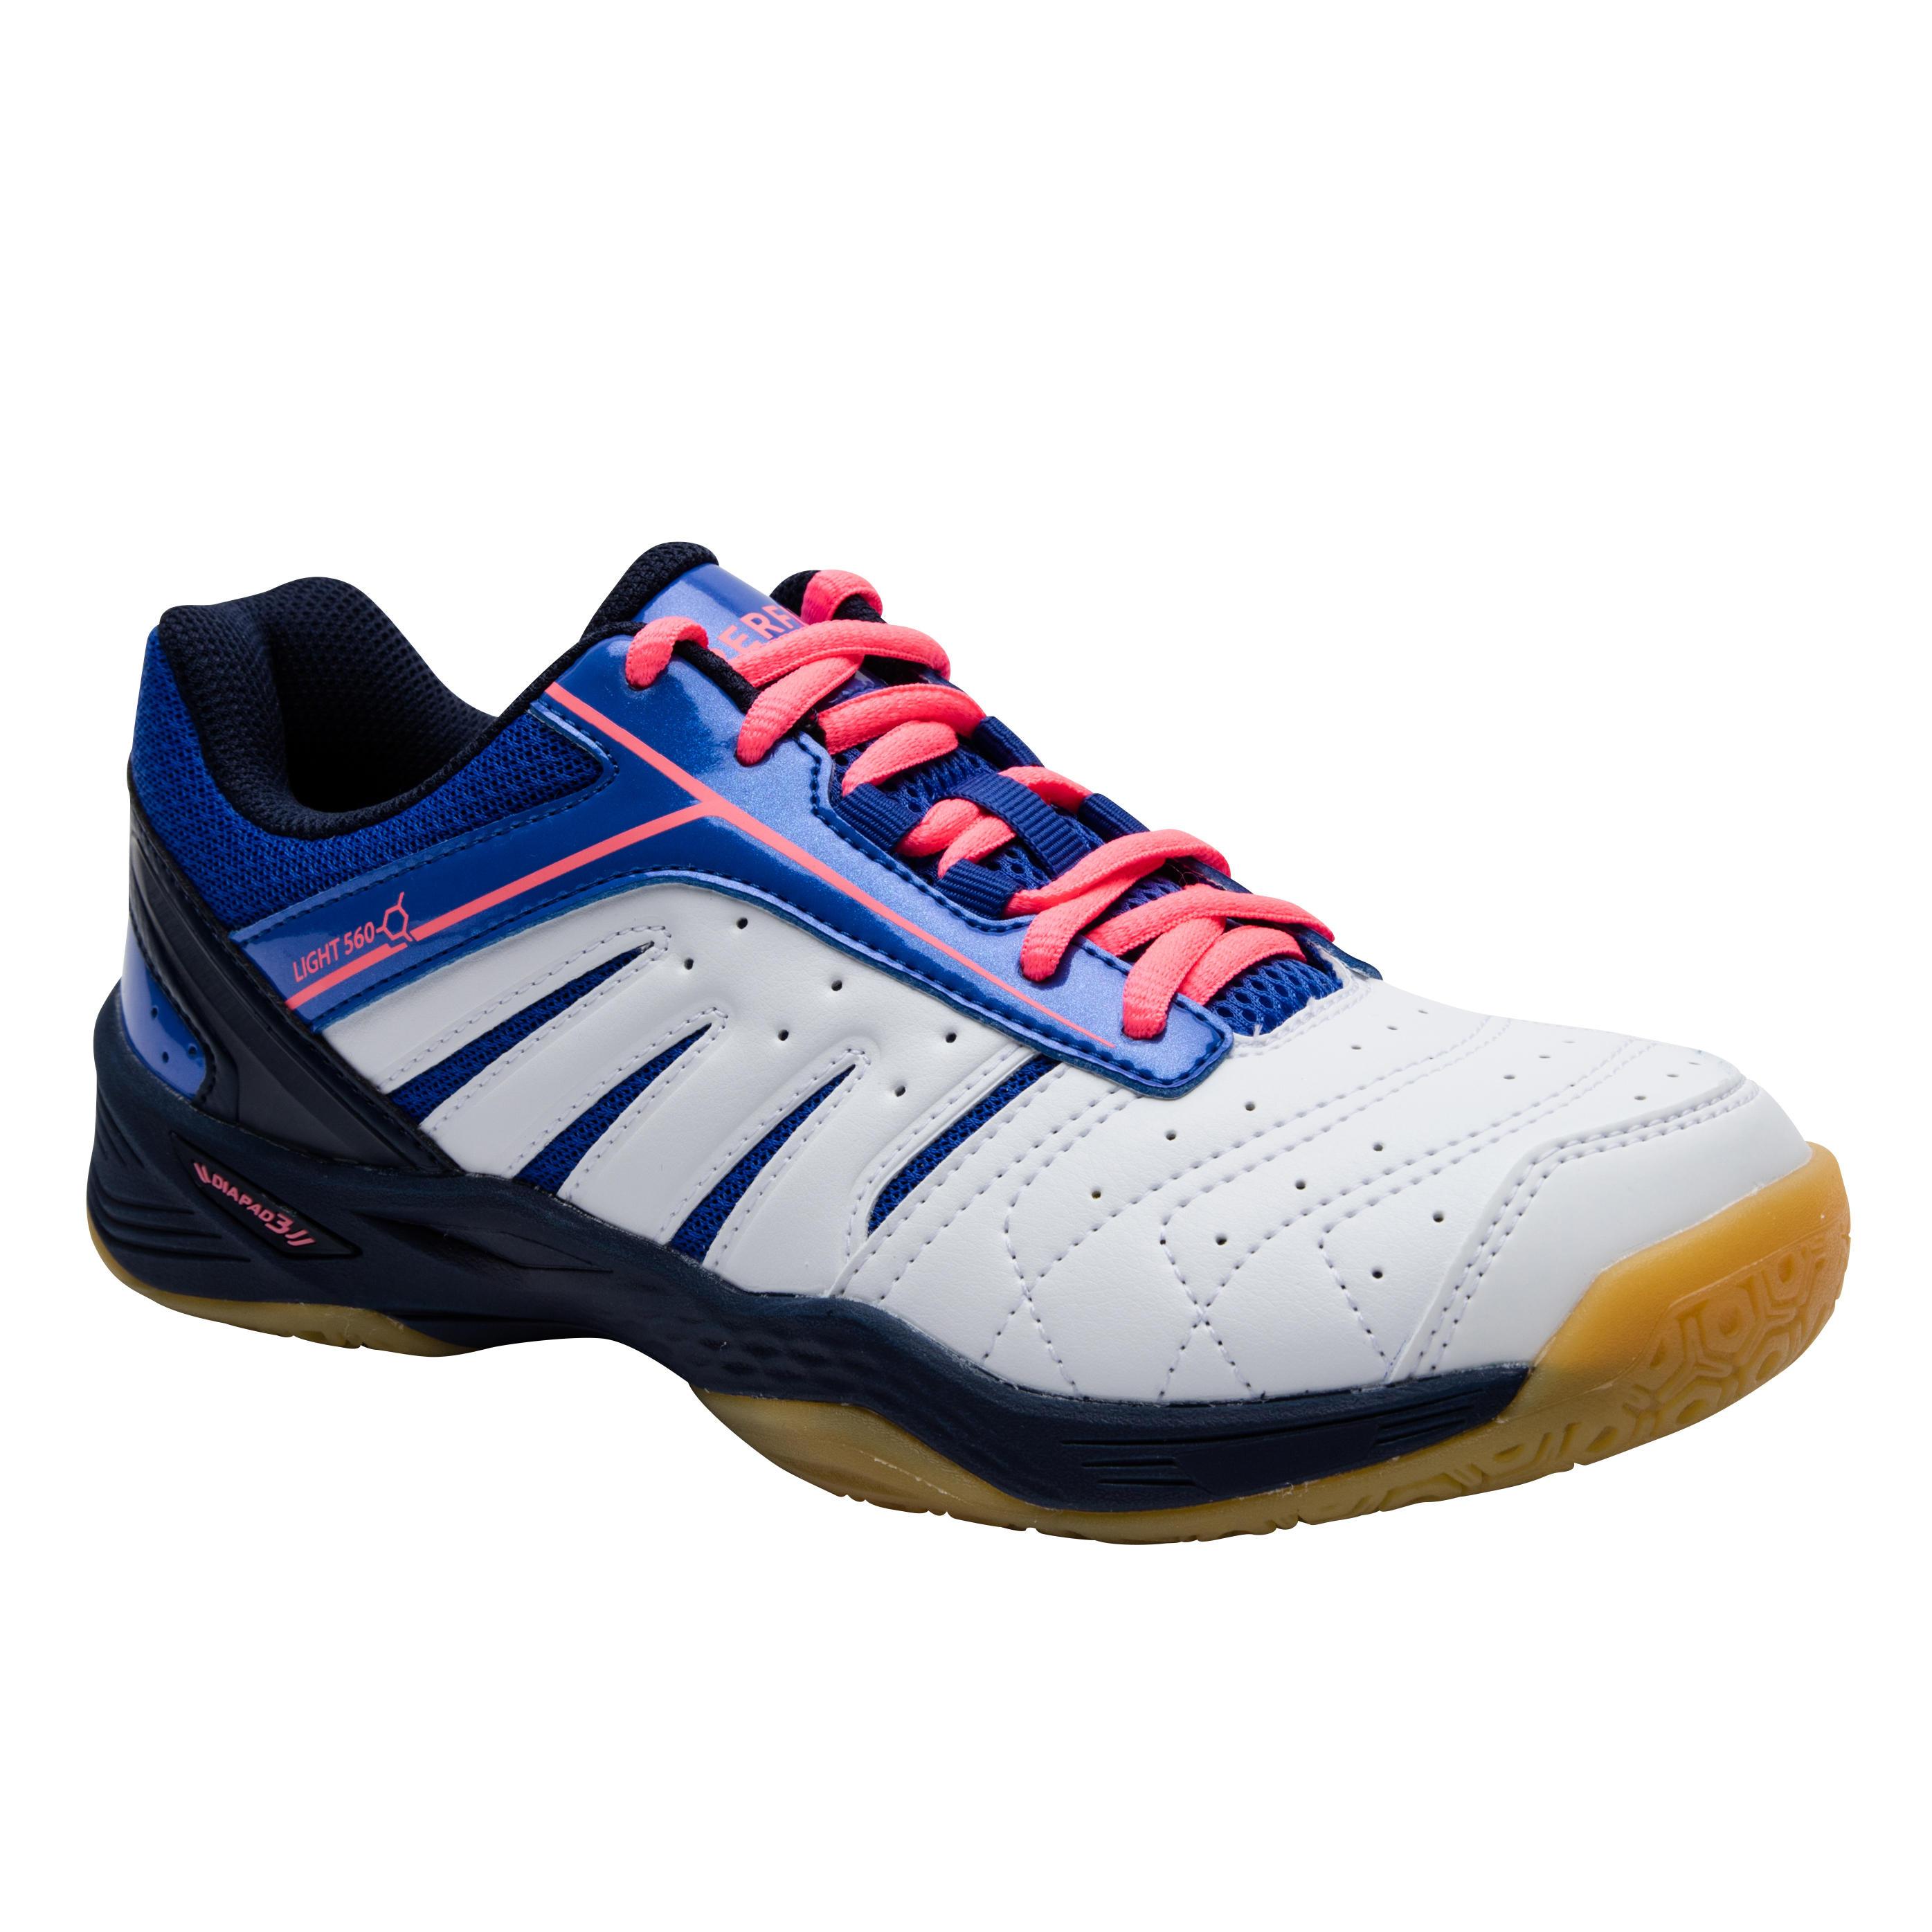 Perfly Chaussures De Badminton Femme BS 560 Lite - Blanc/Bleu - Perfly